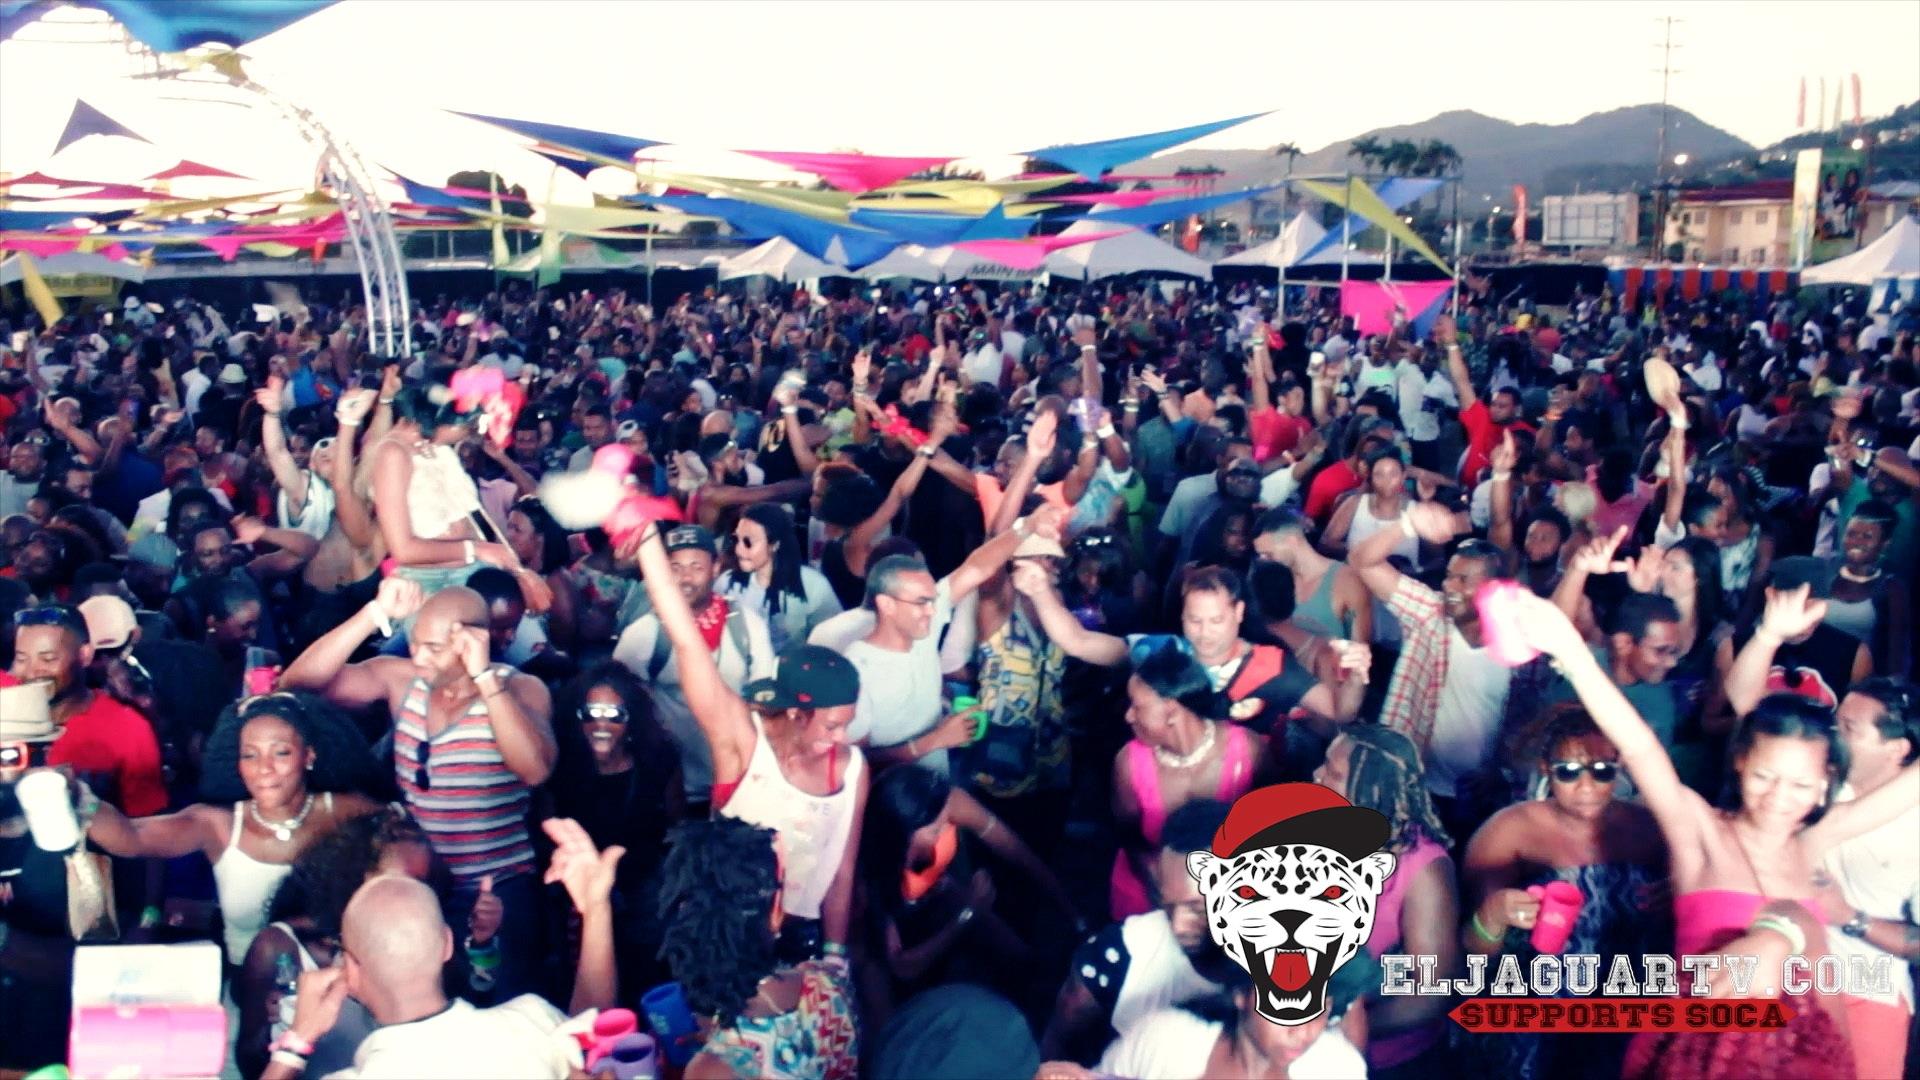 Trinidad Carnival 2015 ep 2 photo11.jpg